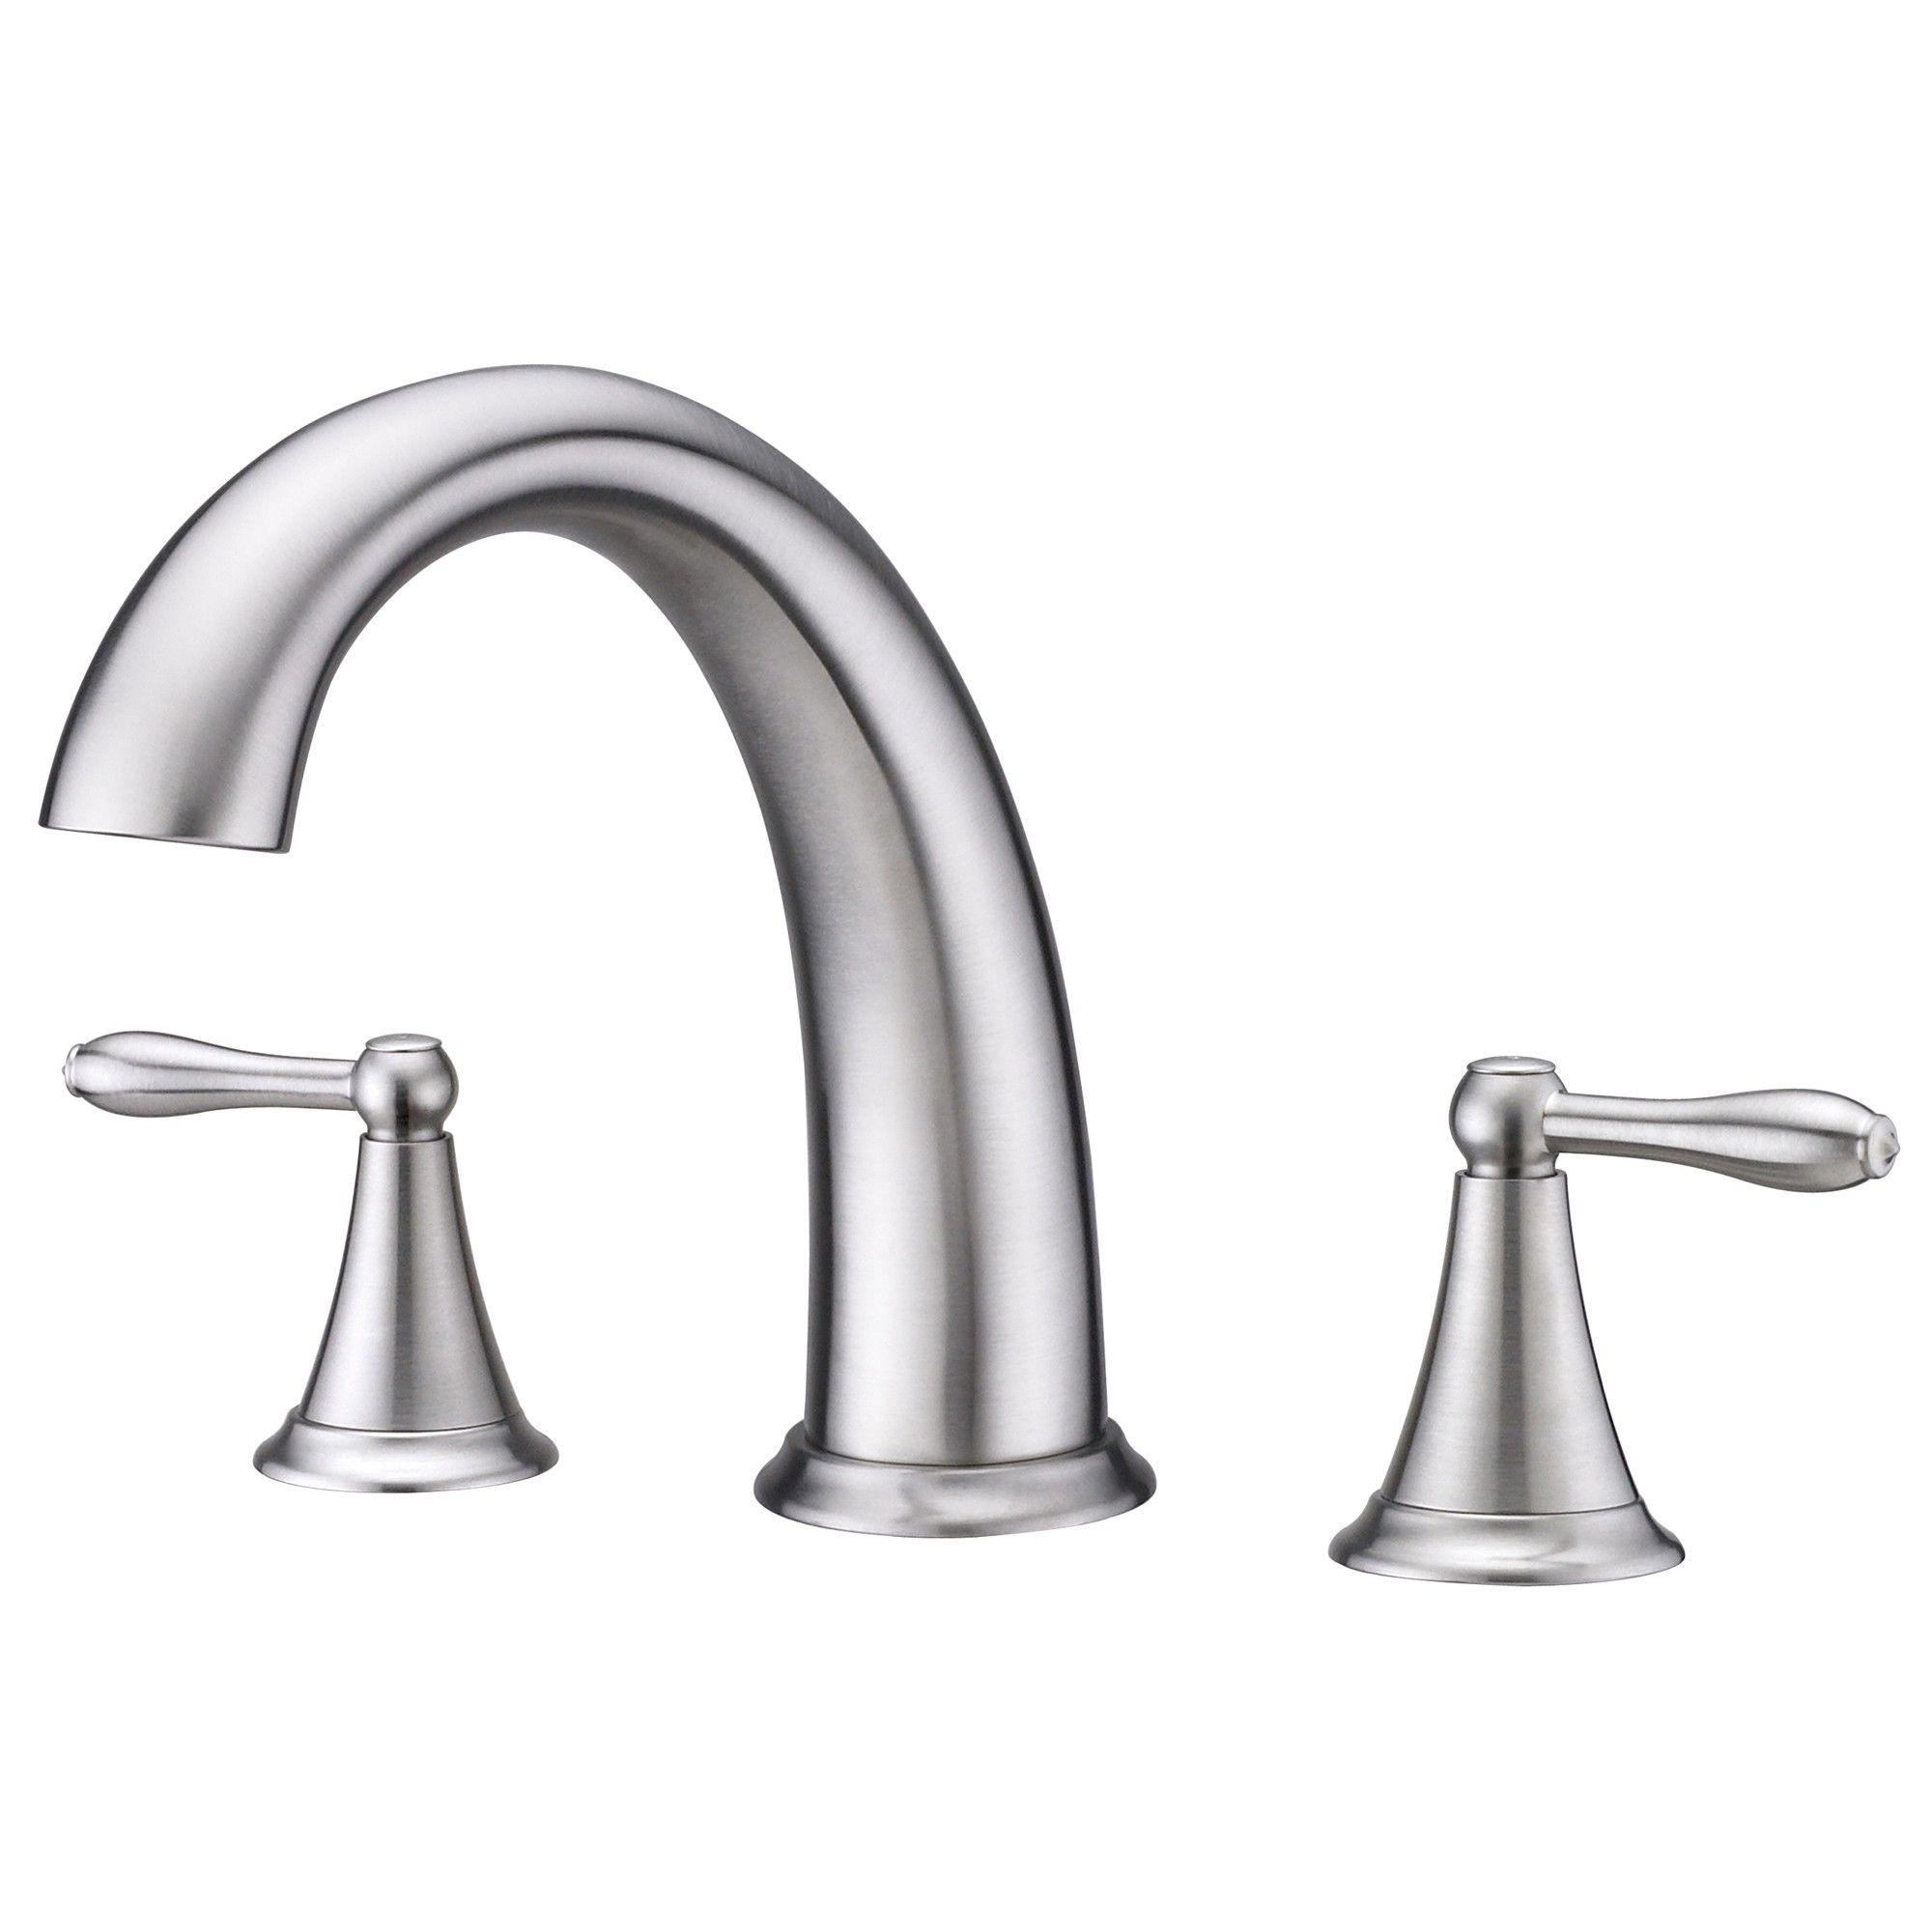 New Delta Porter Roman Tub Faucet Brushed Nickel | Brushed nickel ...